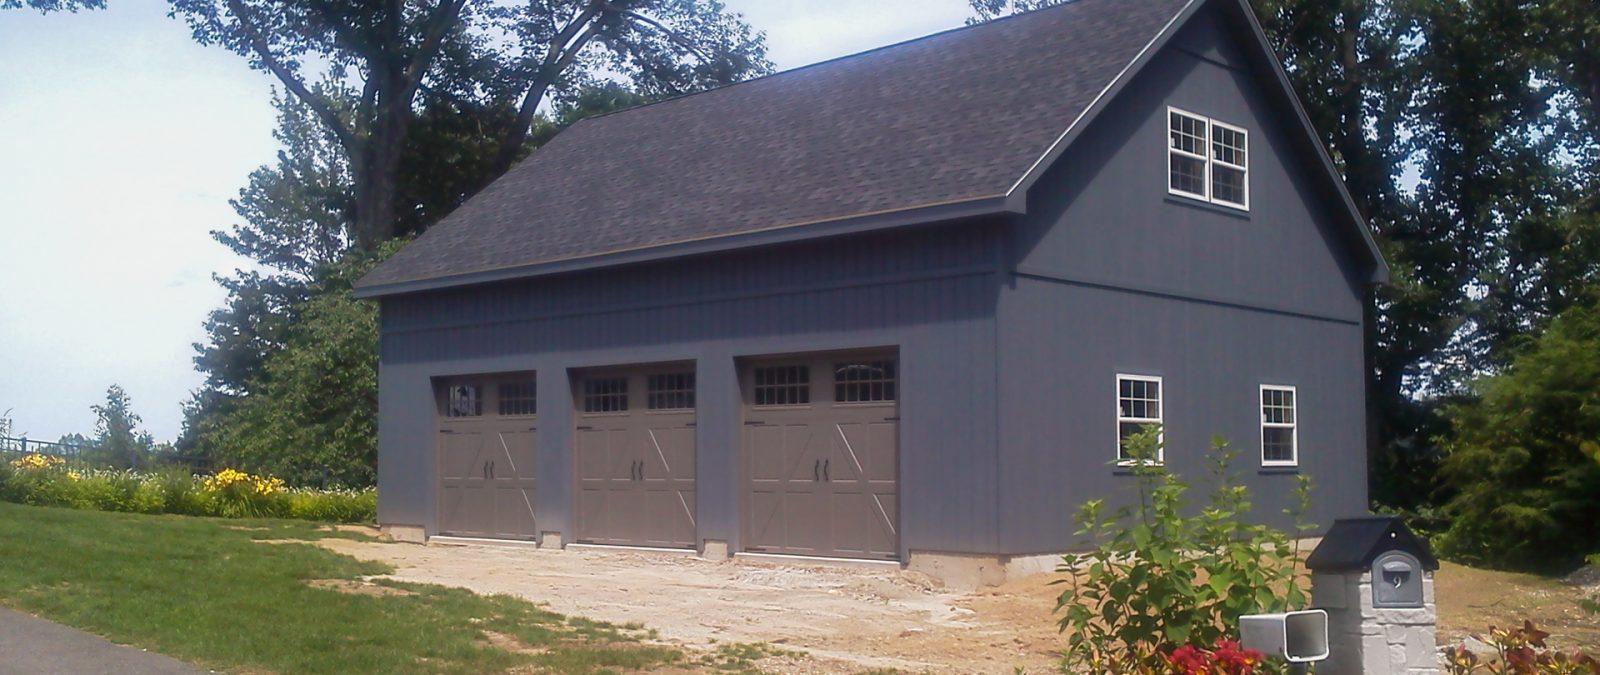 3 car garage with loft